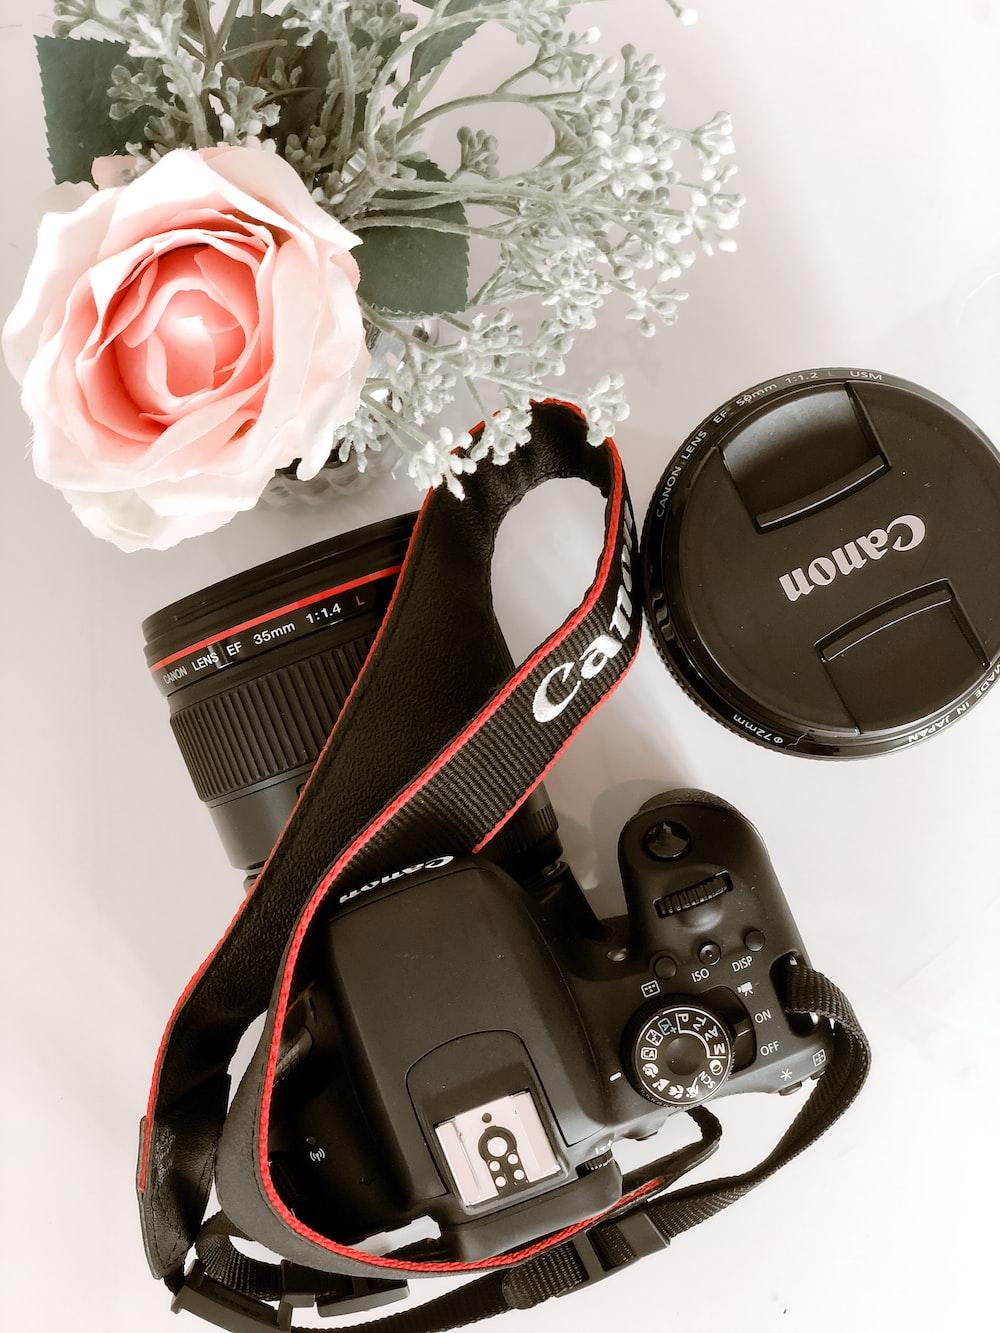 black and red nikon dslr camera on white floral textile